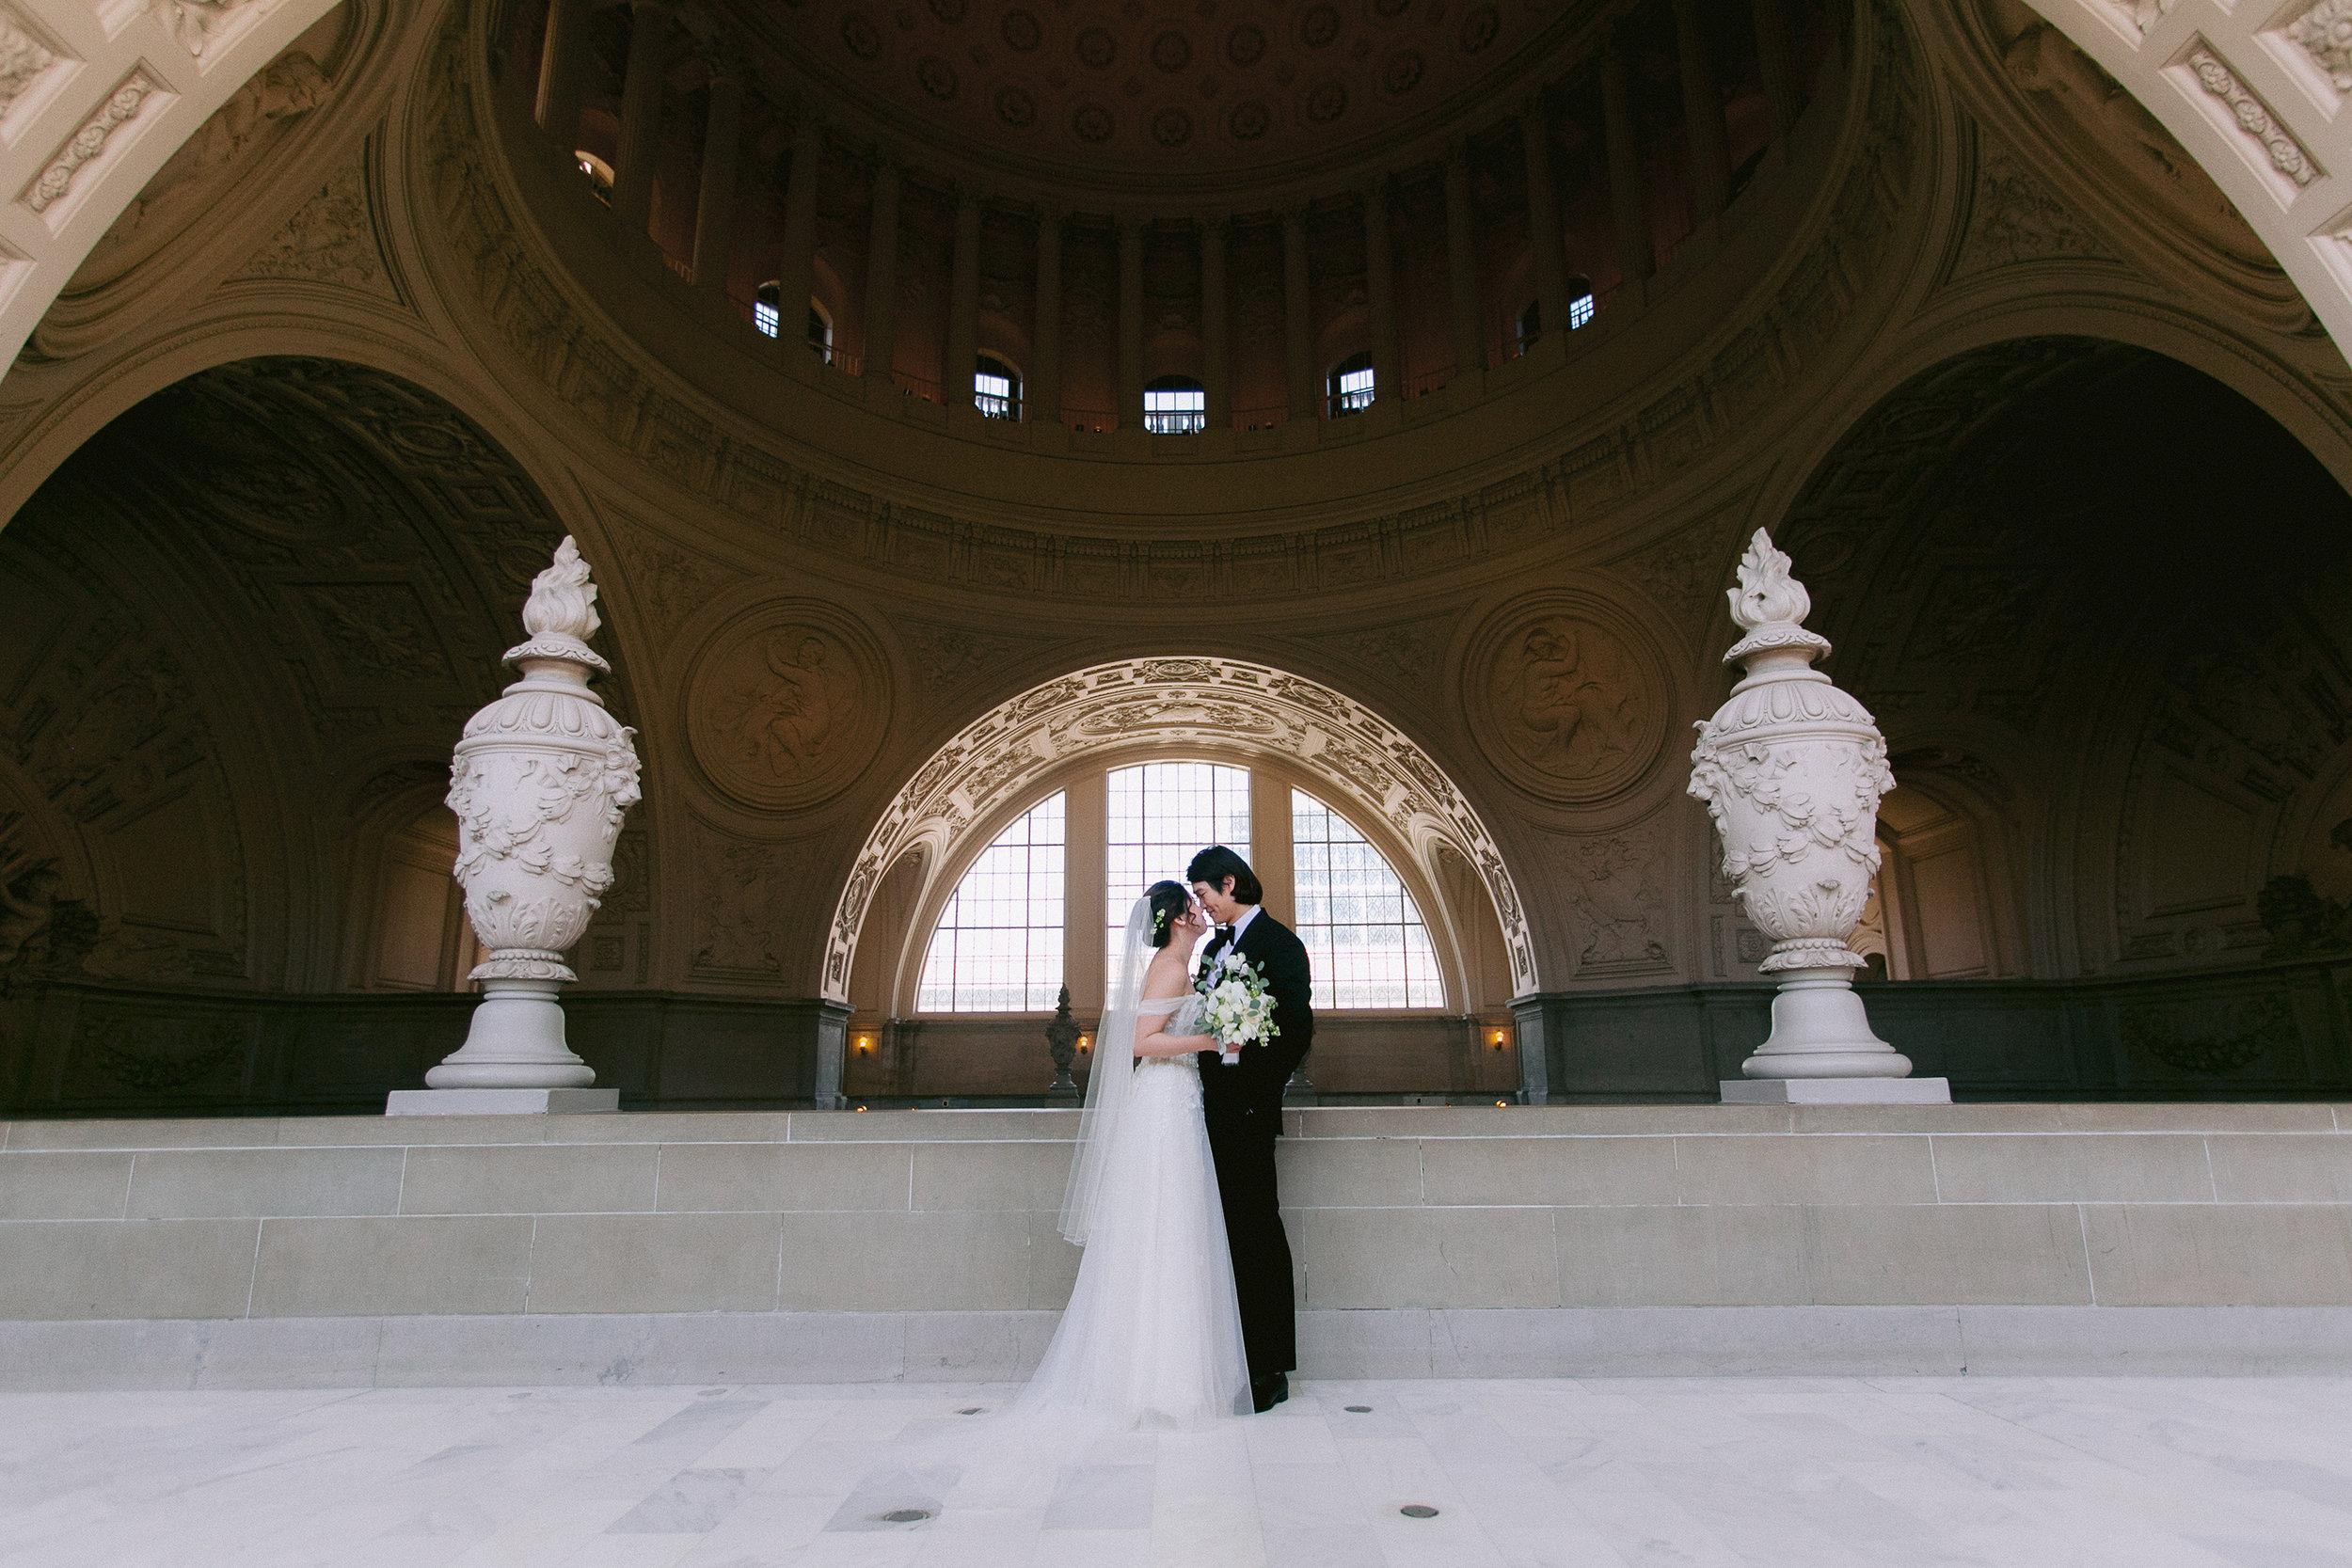 San_Francisco_City_Hall_Wedding_009.jpg